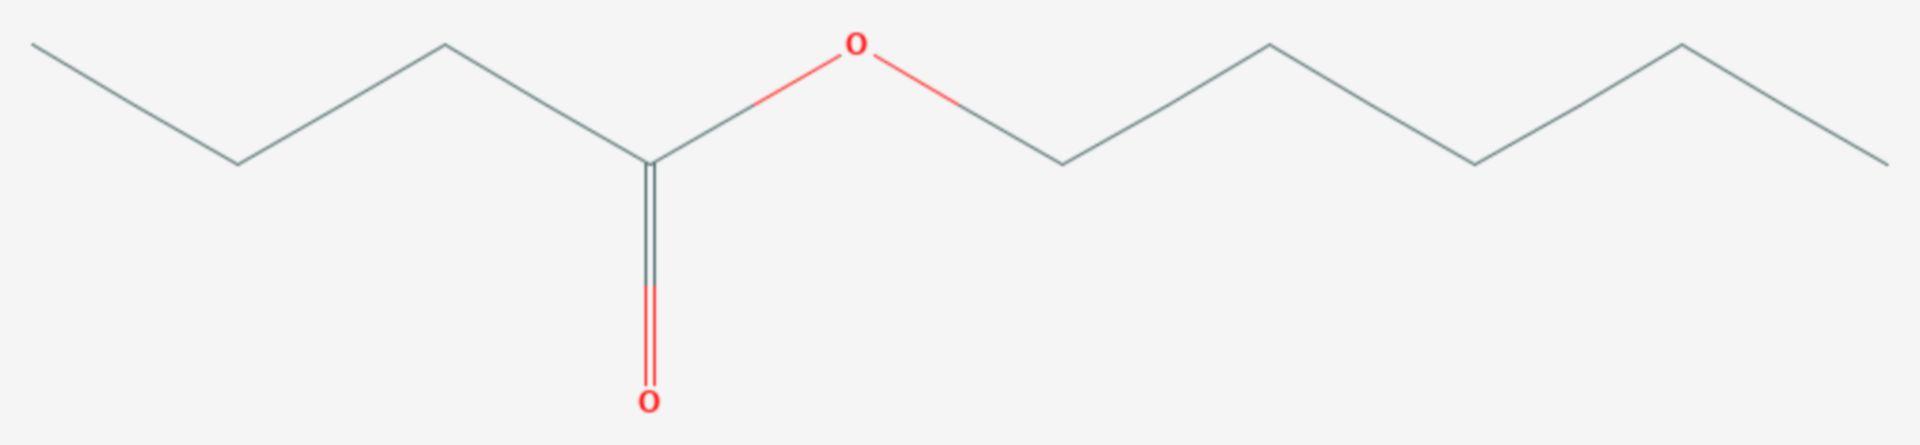 Buttersäurepentylester (Strukturformel)